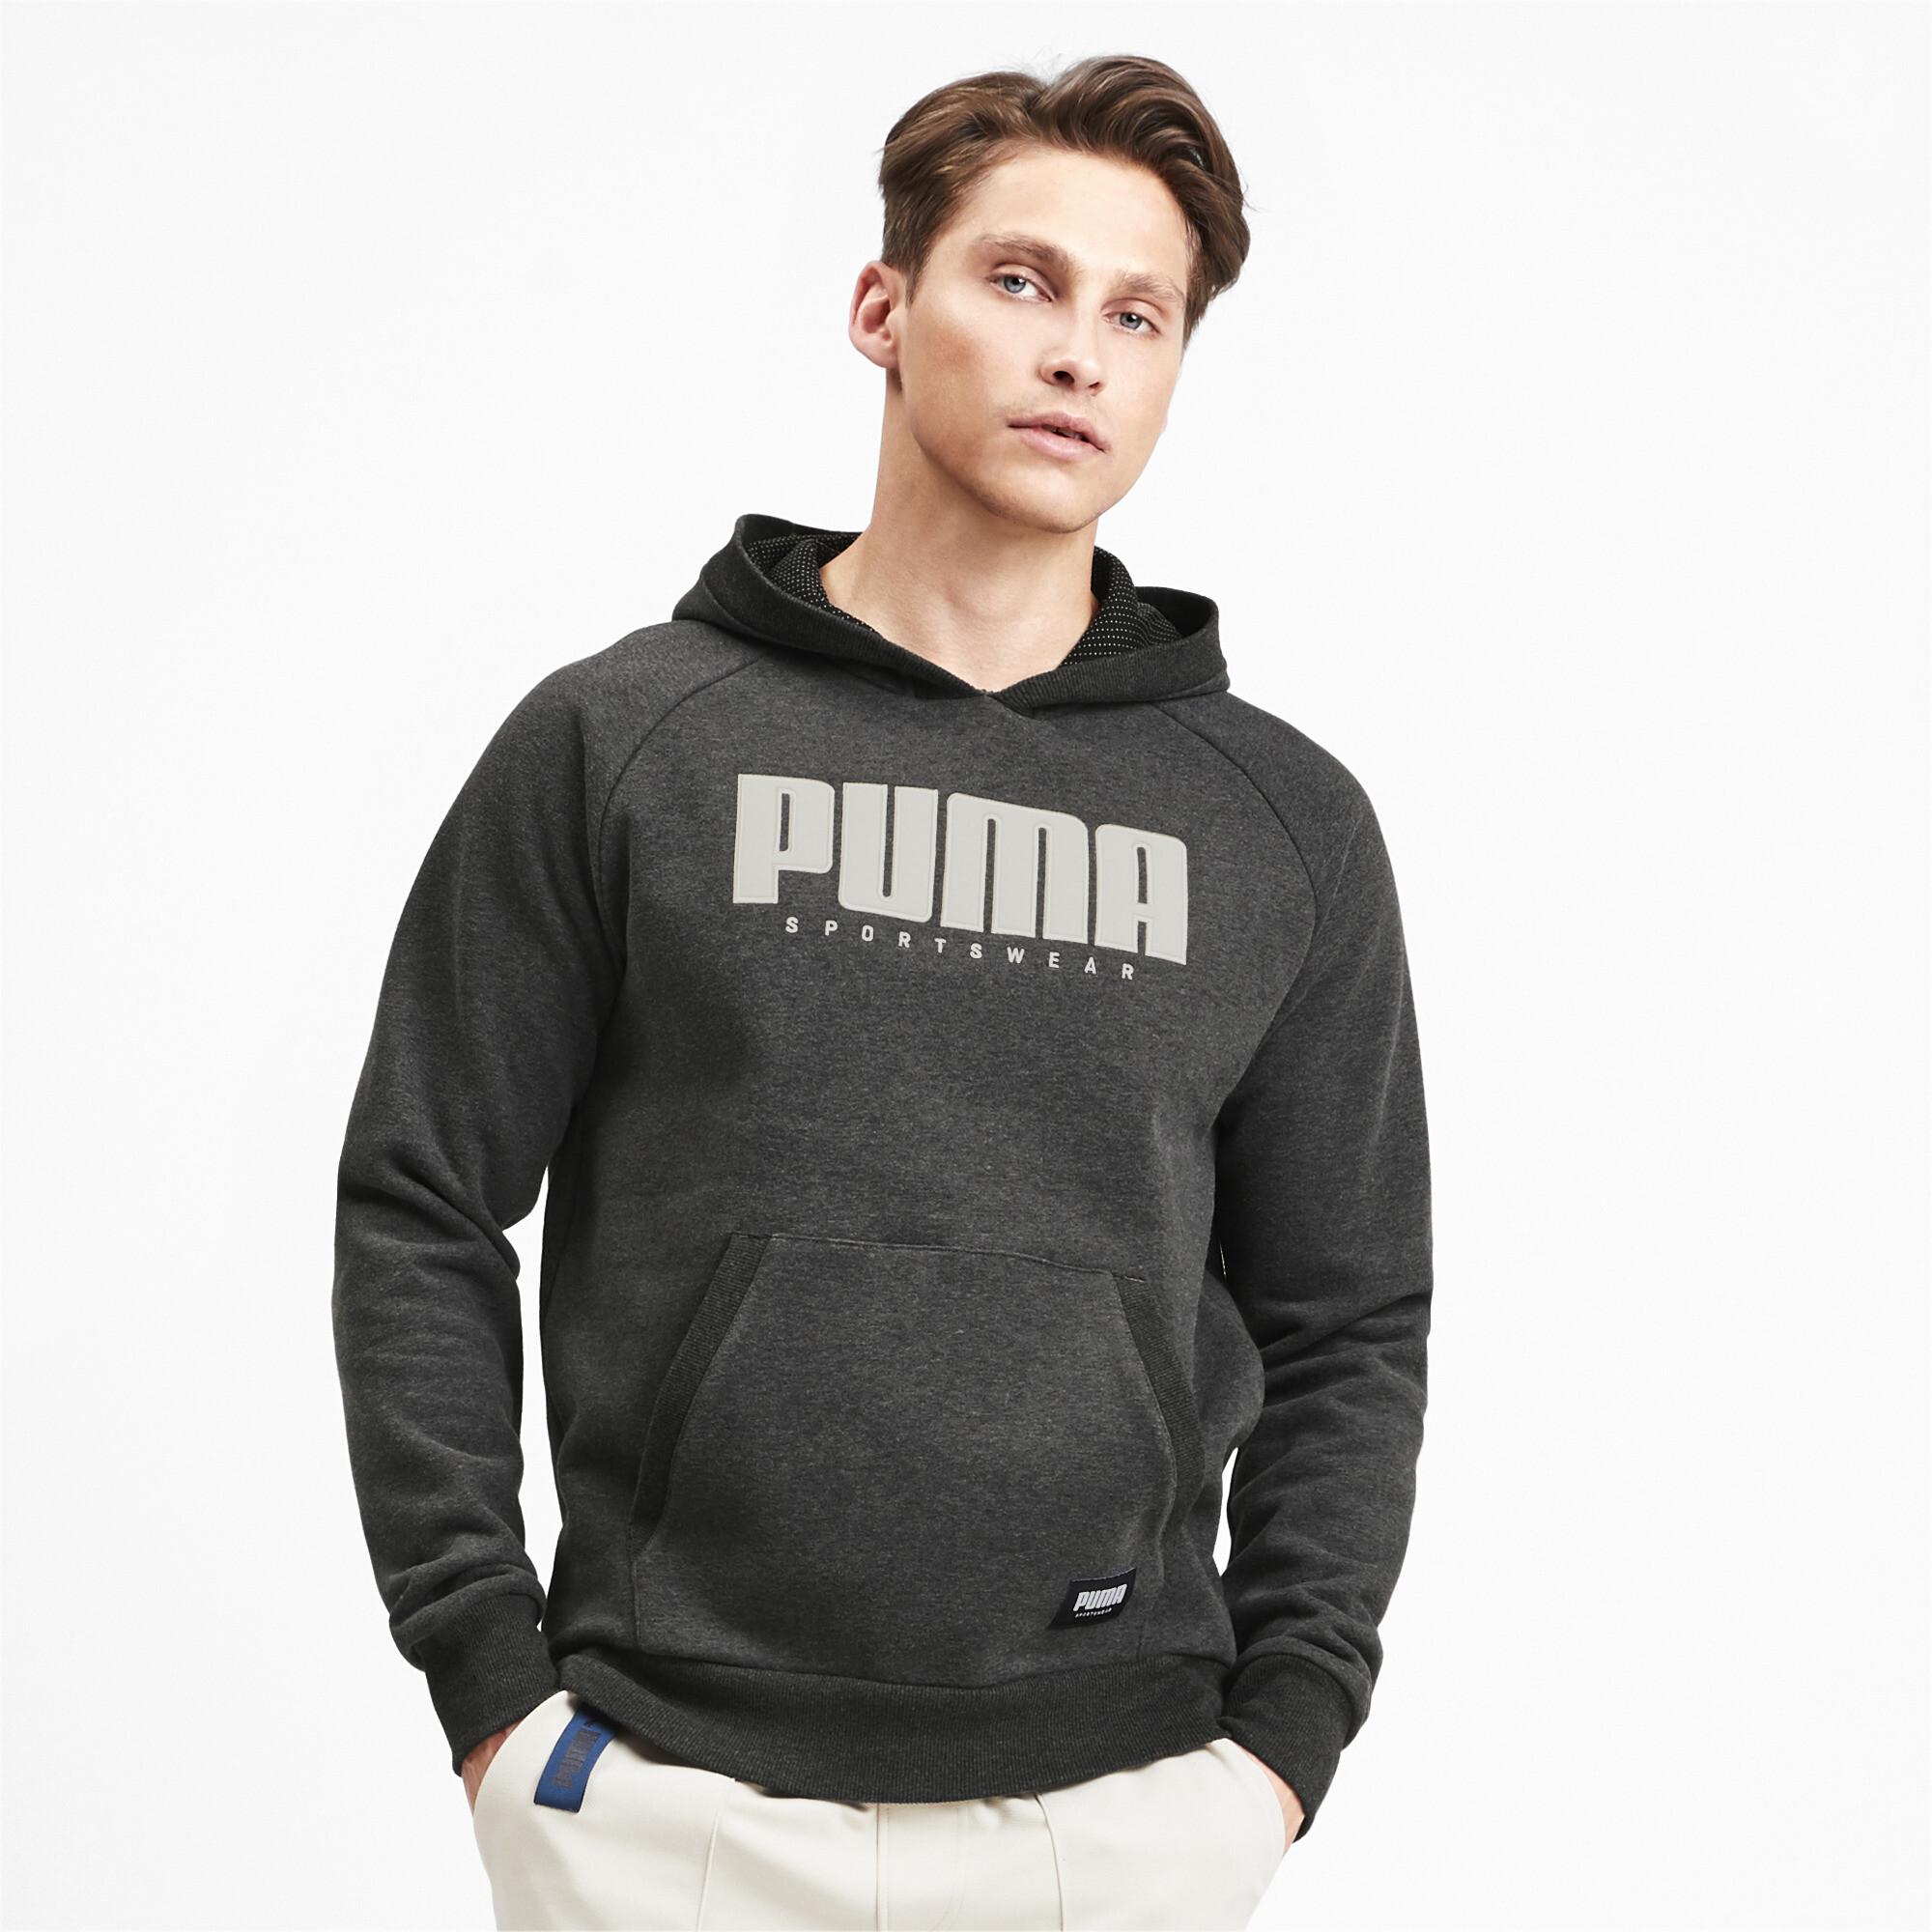 PUMA-Athletics-Men-s-Fleece-Hoodie-Men-Sweat-Basics thumbnail 4